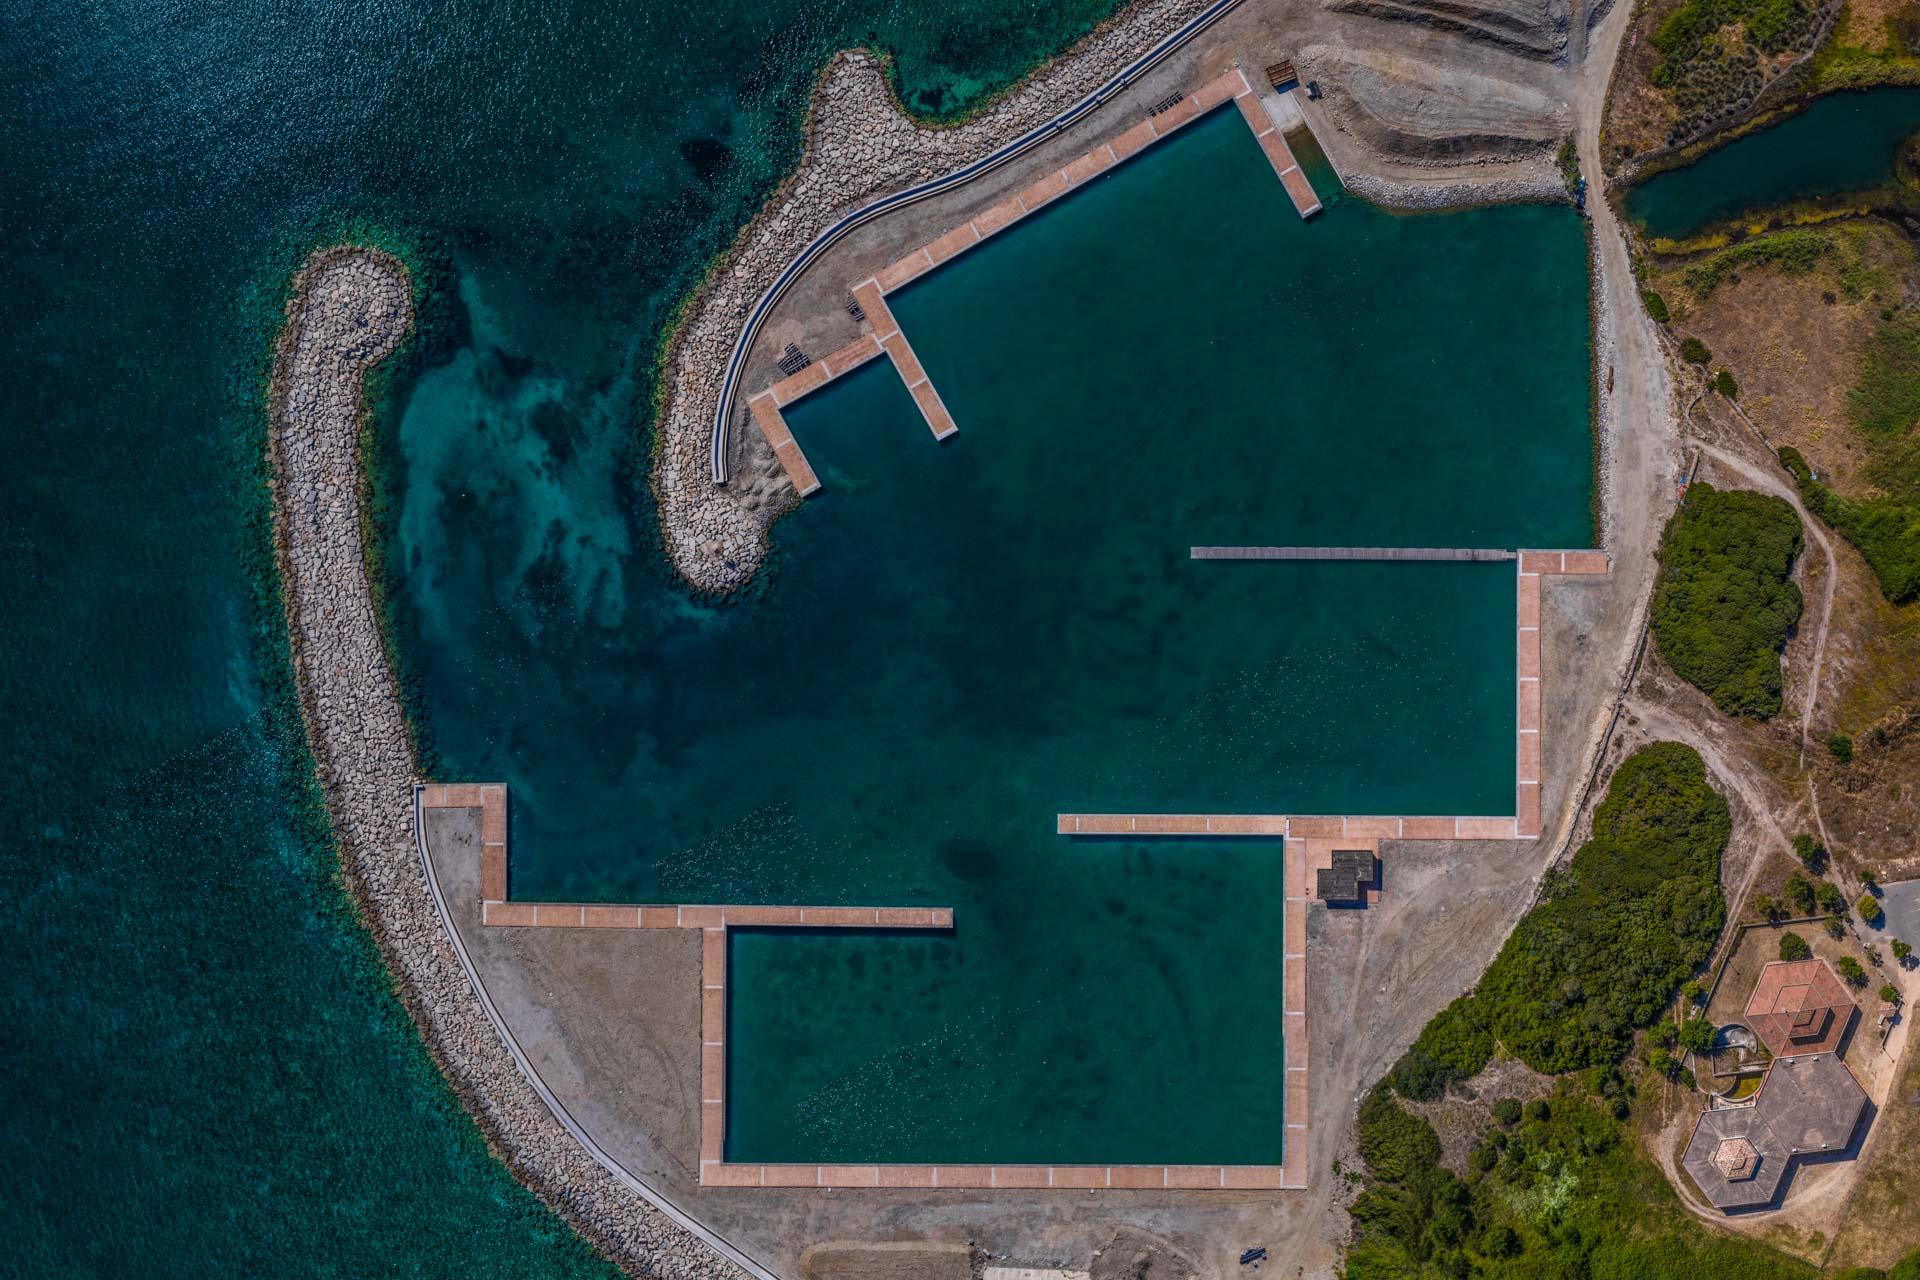 Geometry Port Sardinia Aerial Photography drone Enrico Pescantini